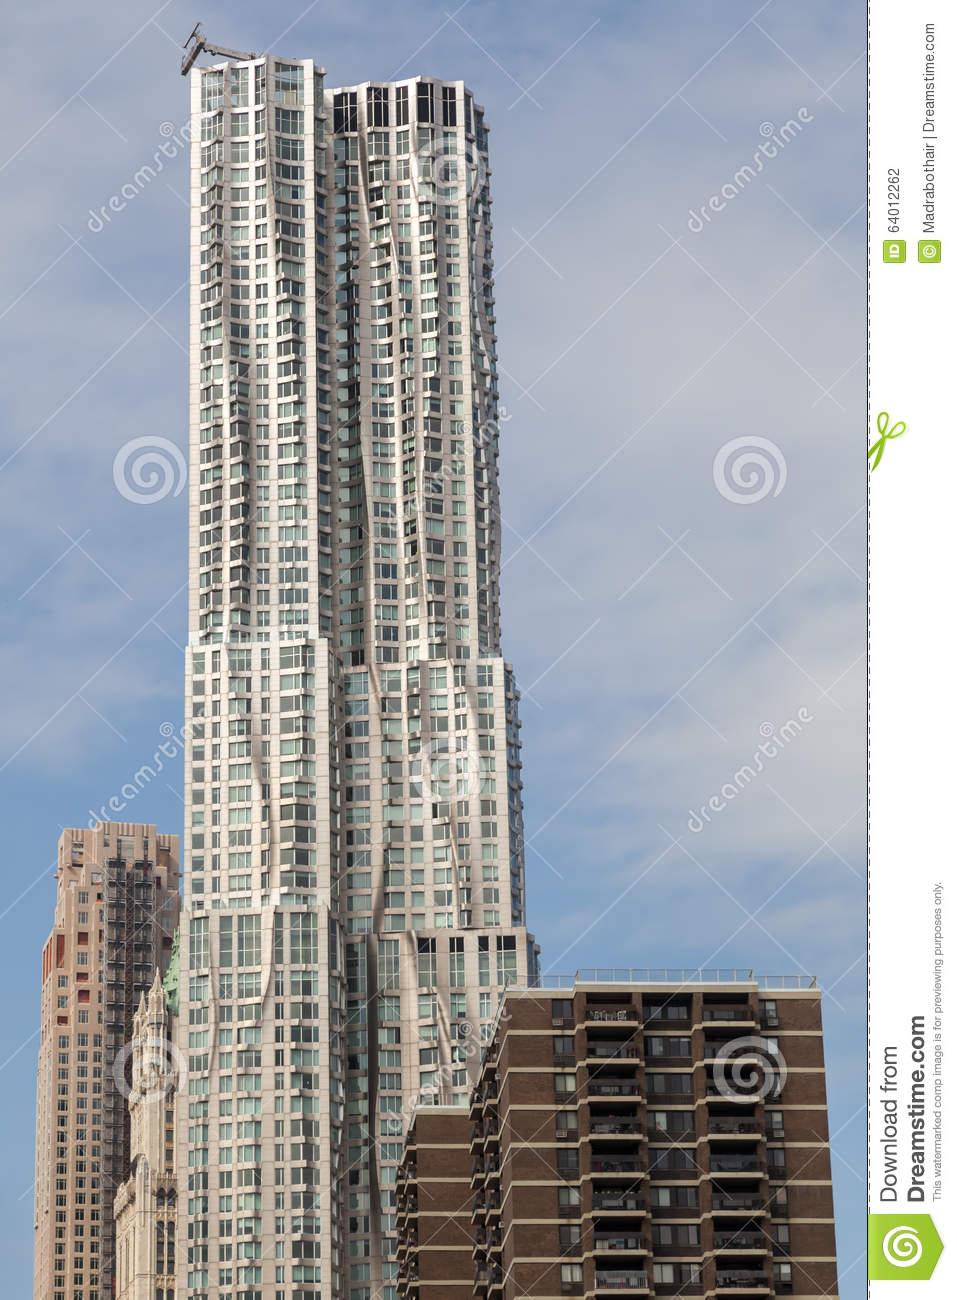 Skyscraper 8 Spruce Street Designed By Frank Gehry In Manhattan.